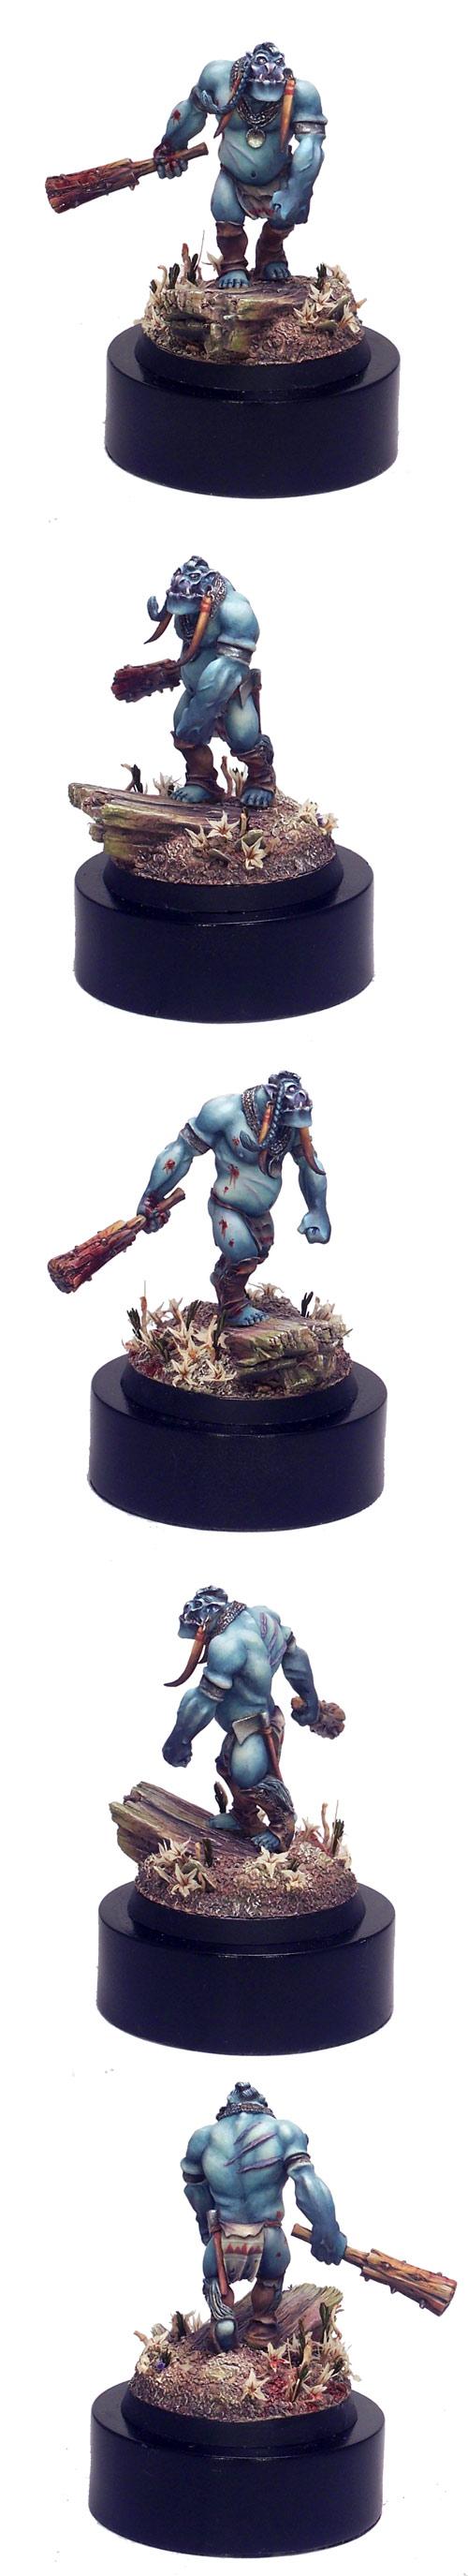 Kraken - Aurlok Totem Warrior